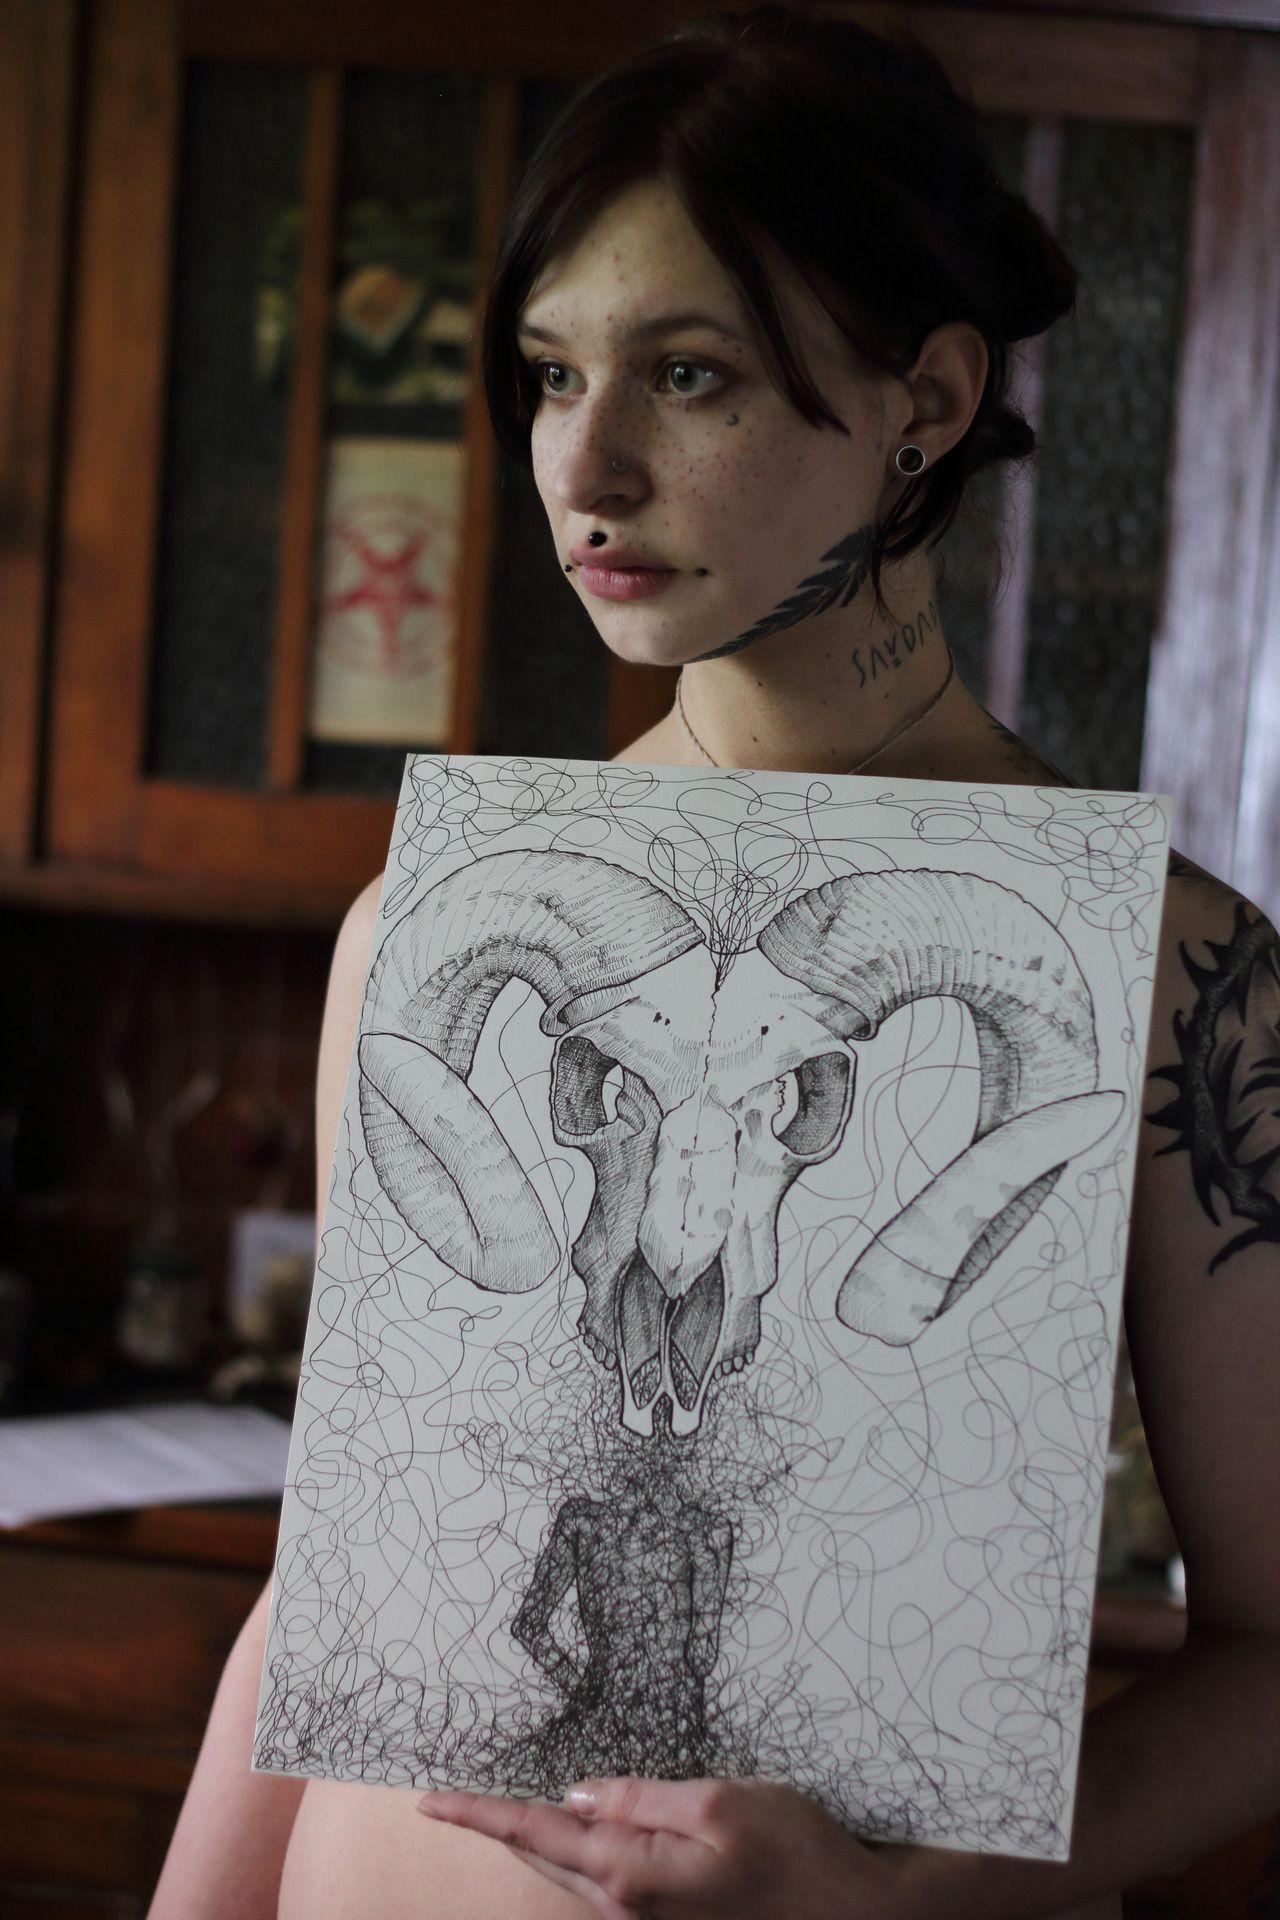 These drawing is alsoavailable as a print on my etsy store <3 - #art #artprint #darkart #darkarti #Drawing #etsy #Fücksin #Fucksteufelswild #fvcksi #Fvcksteufelswild #goatskull #linework #occultart #print #satanicart #witch #witchy